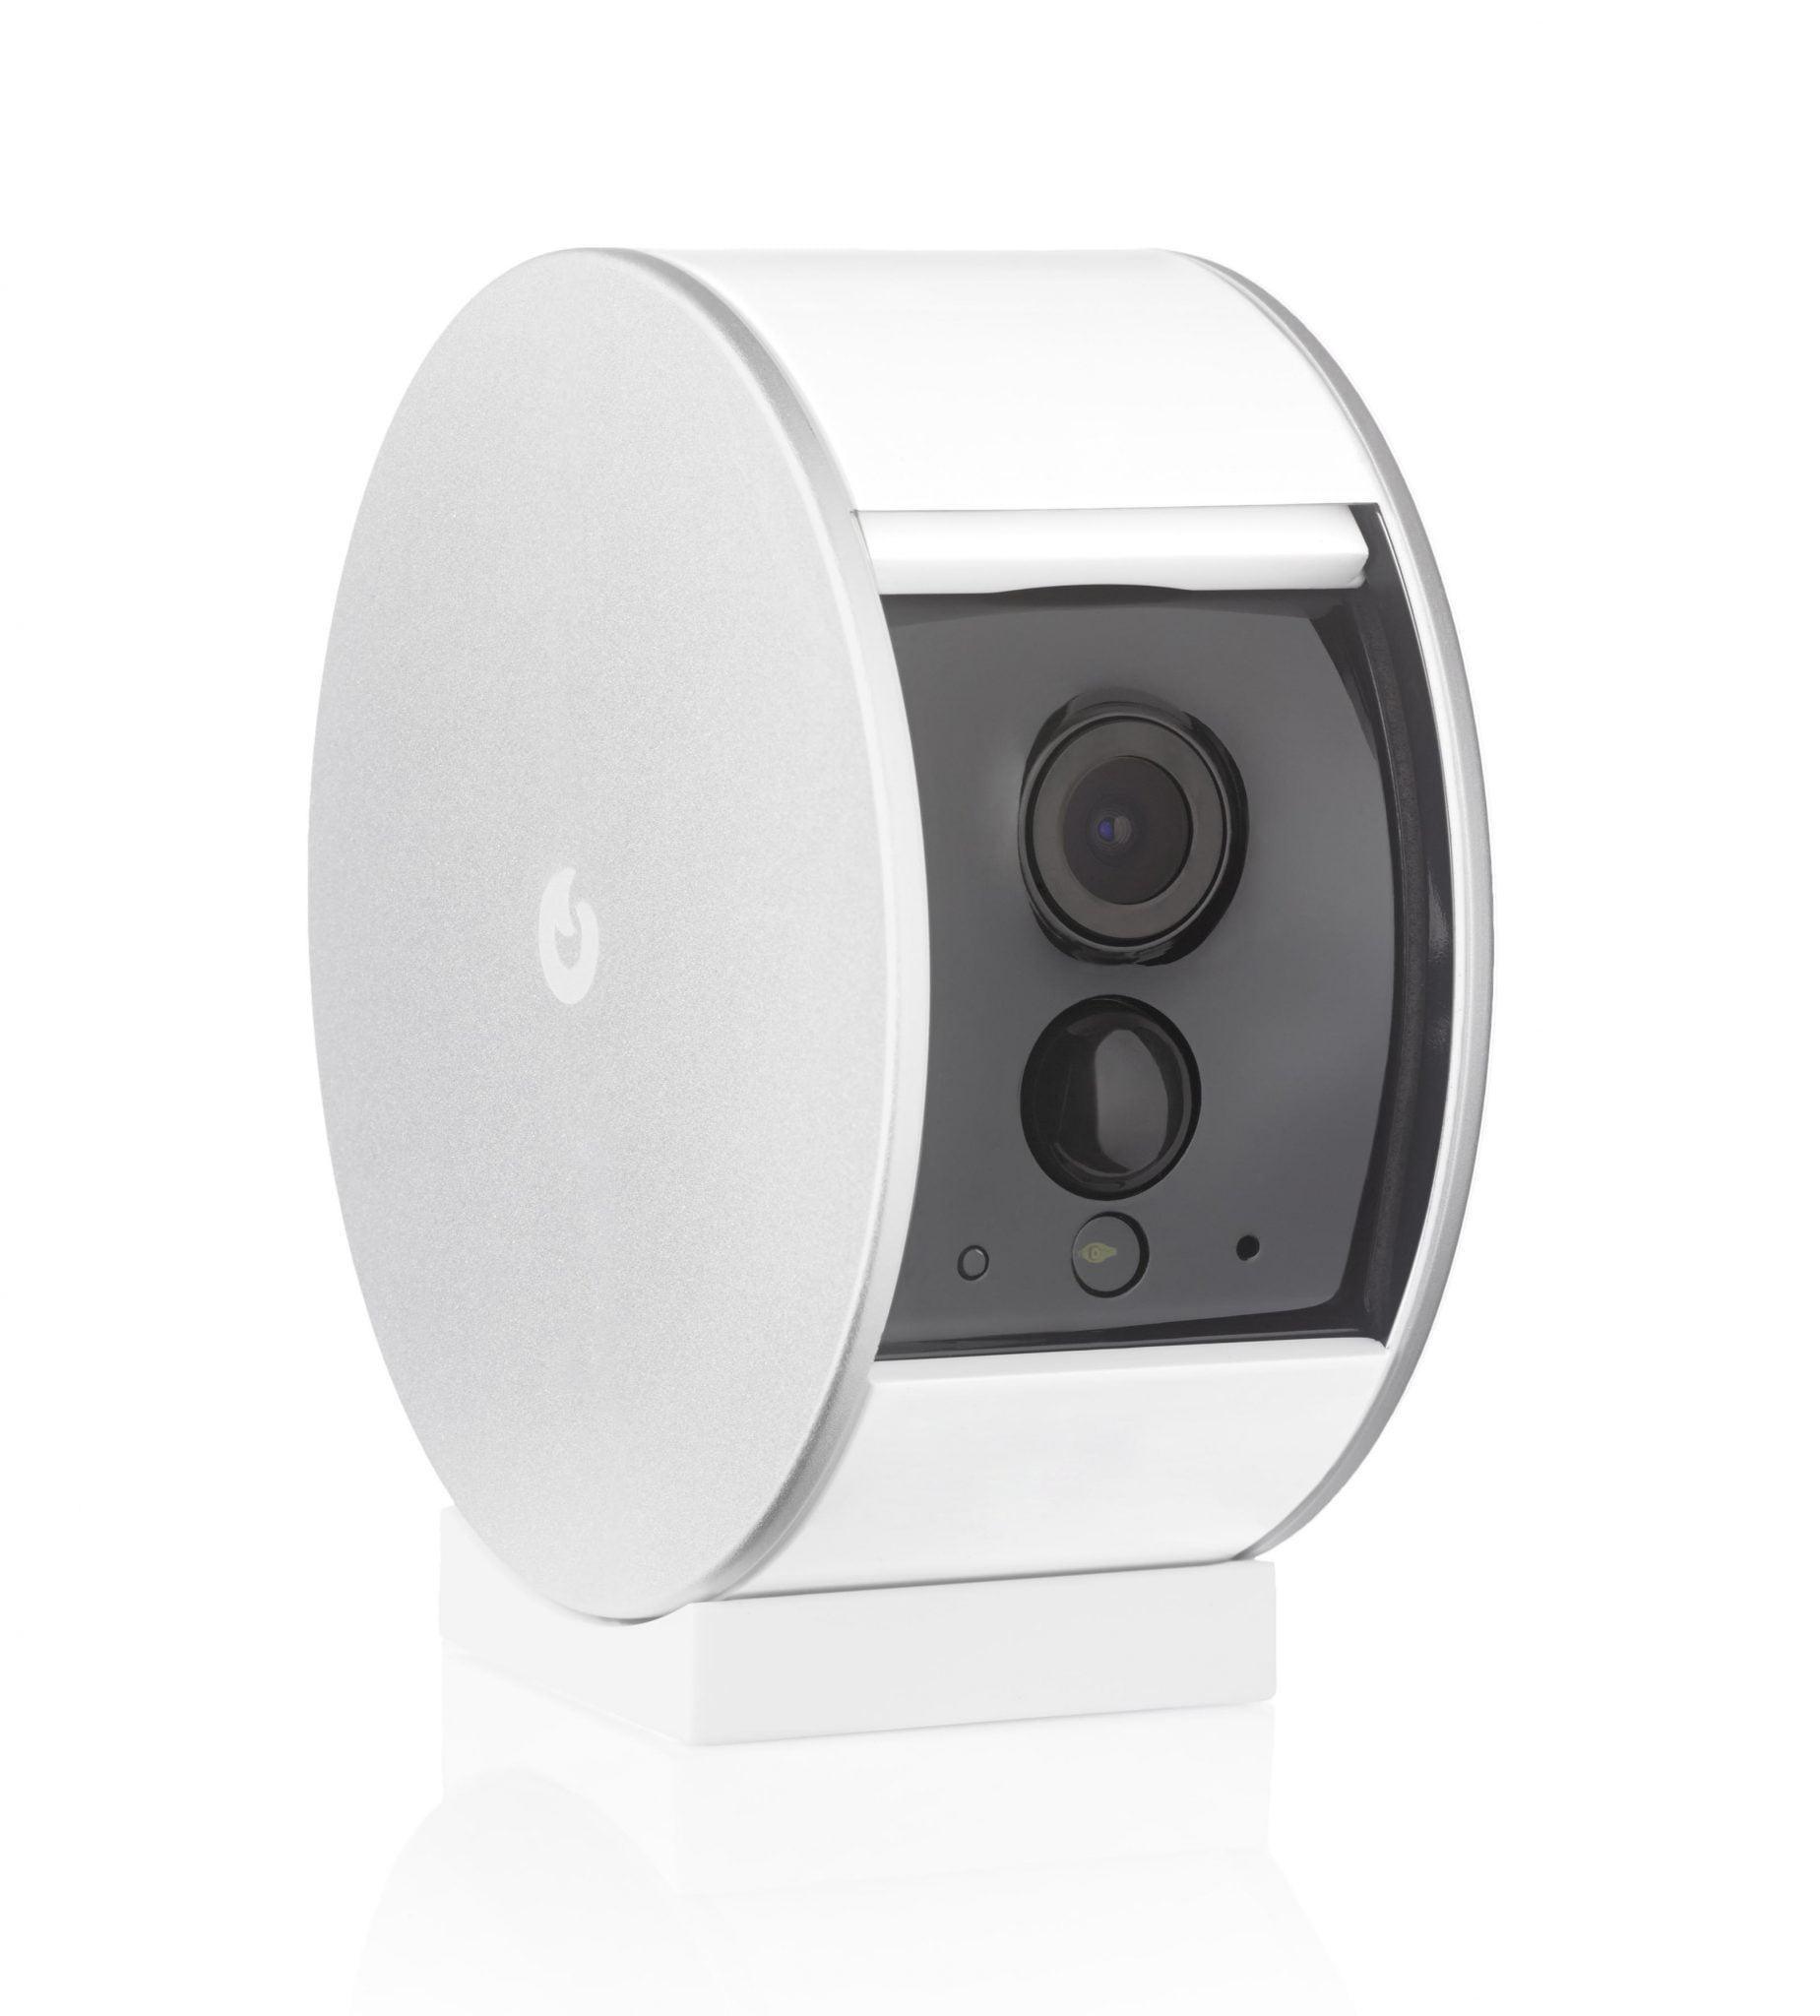 Grazie a myfox security camera e myfox home alarm - Myfox home alarm ...